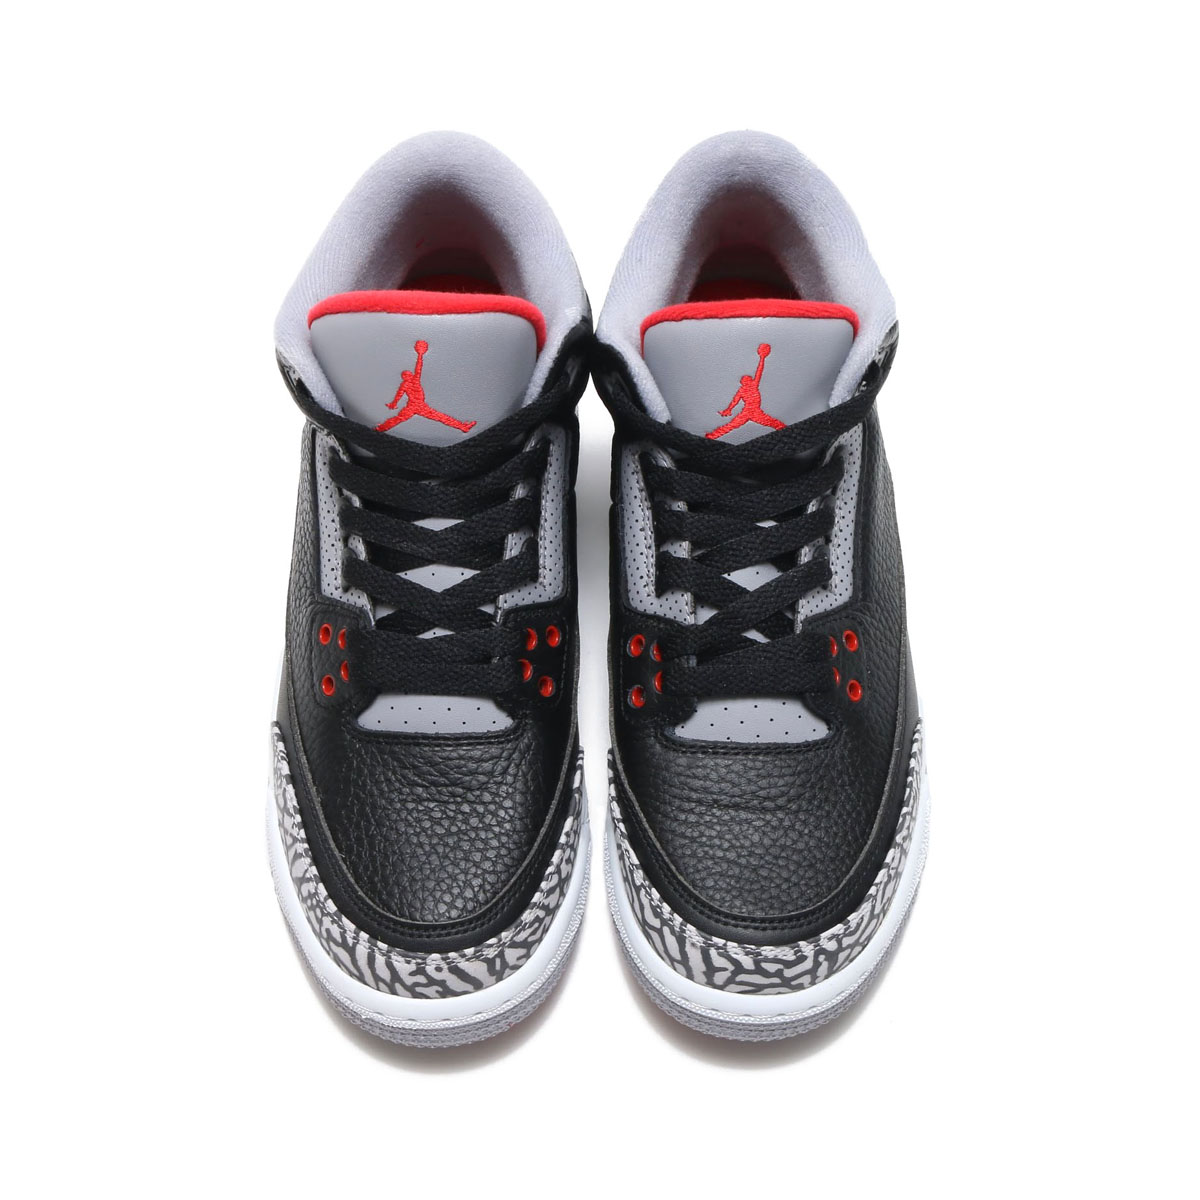 pretty cheap nice shoes arriving online store 8a4bf 96b4b nike air jordan first class td 001 ...